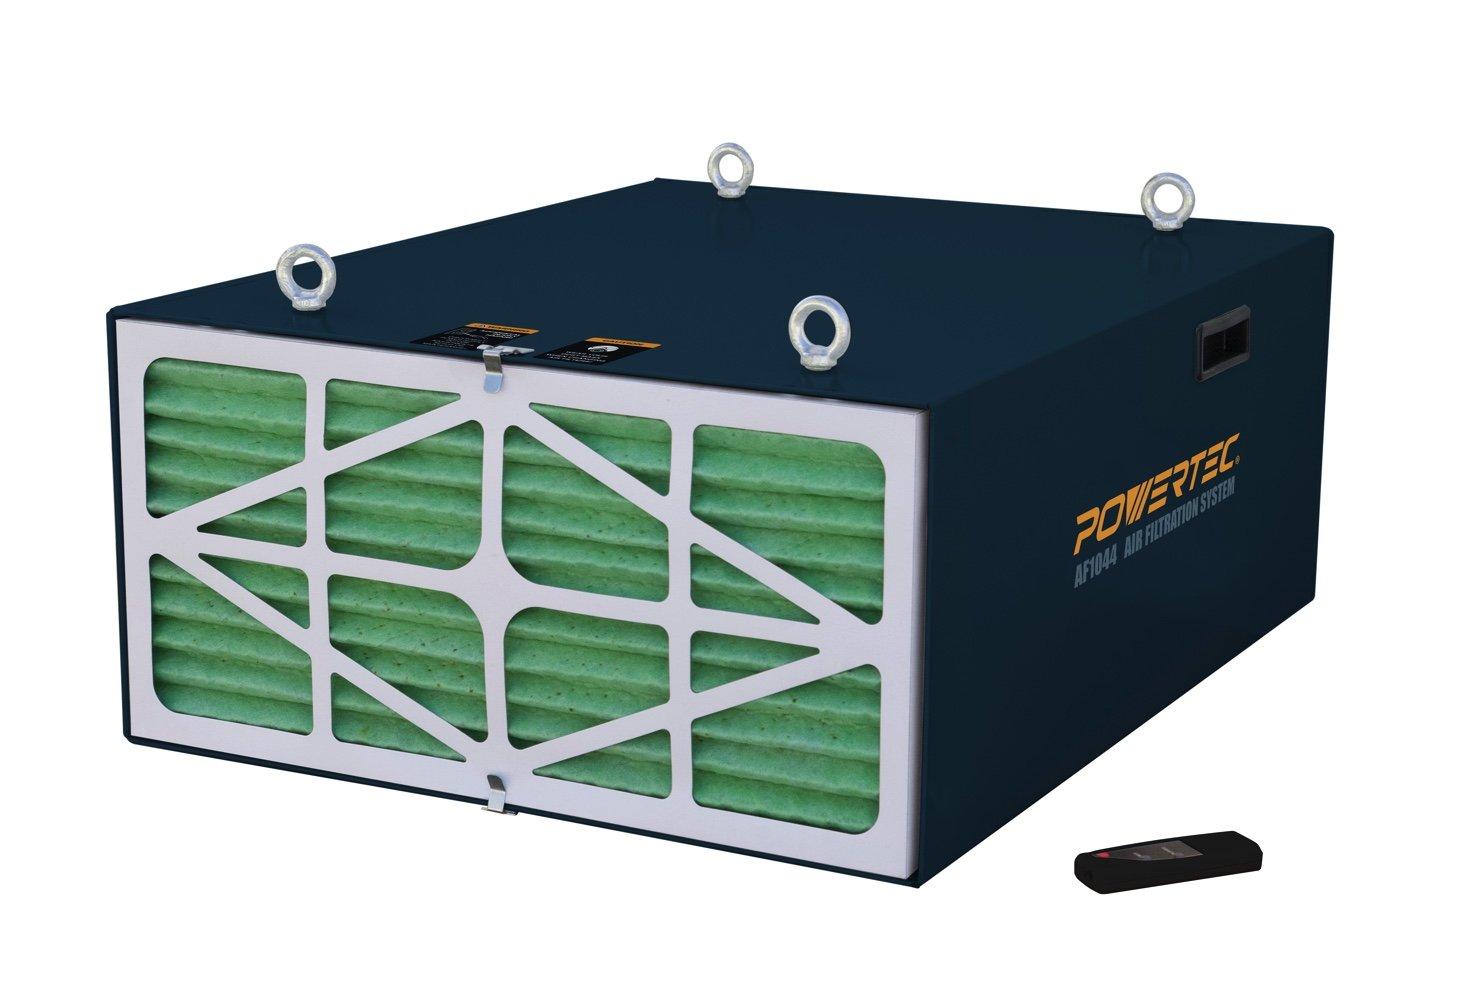 POWERTEC AF1044 3SPD Air Filtration System, 556/702/1044-CFM by POWERTEC